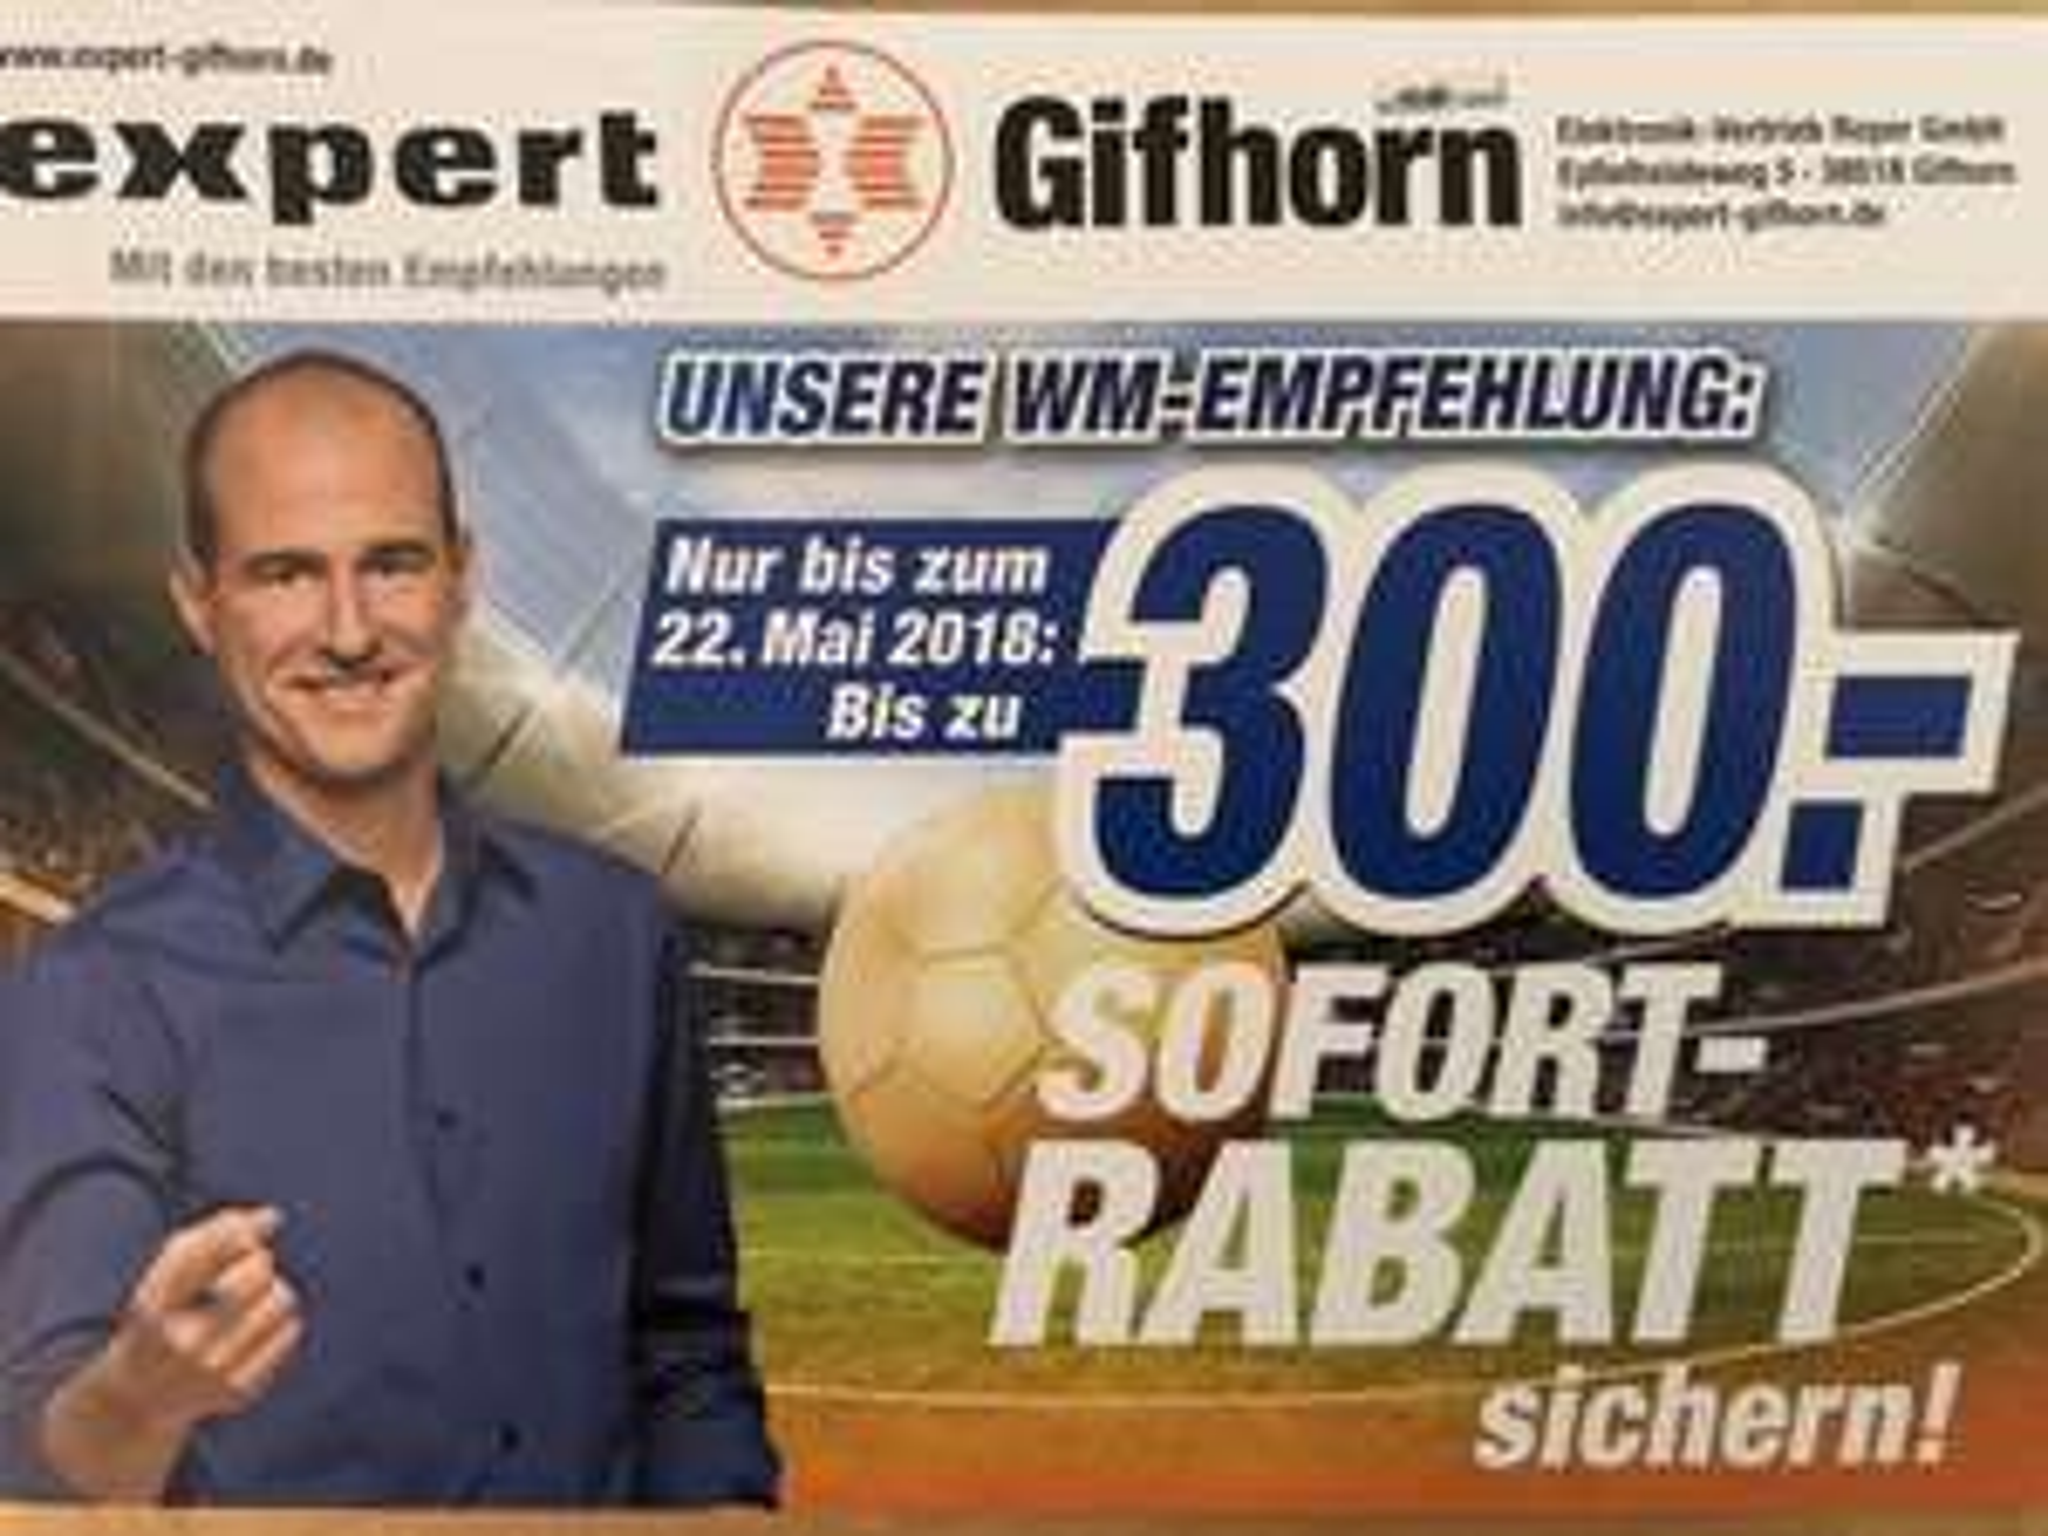 Expert Gifhorn [Lokal] Bis zu 300€ Sofort-Rabatt sichern